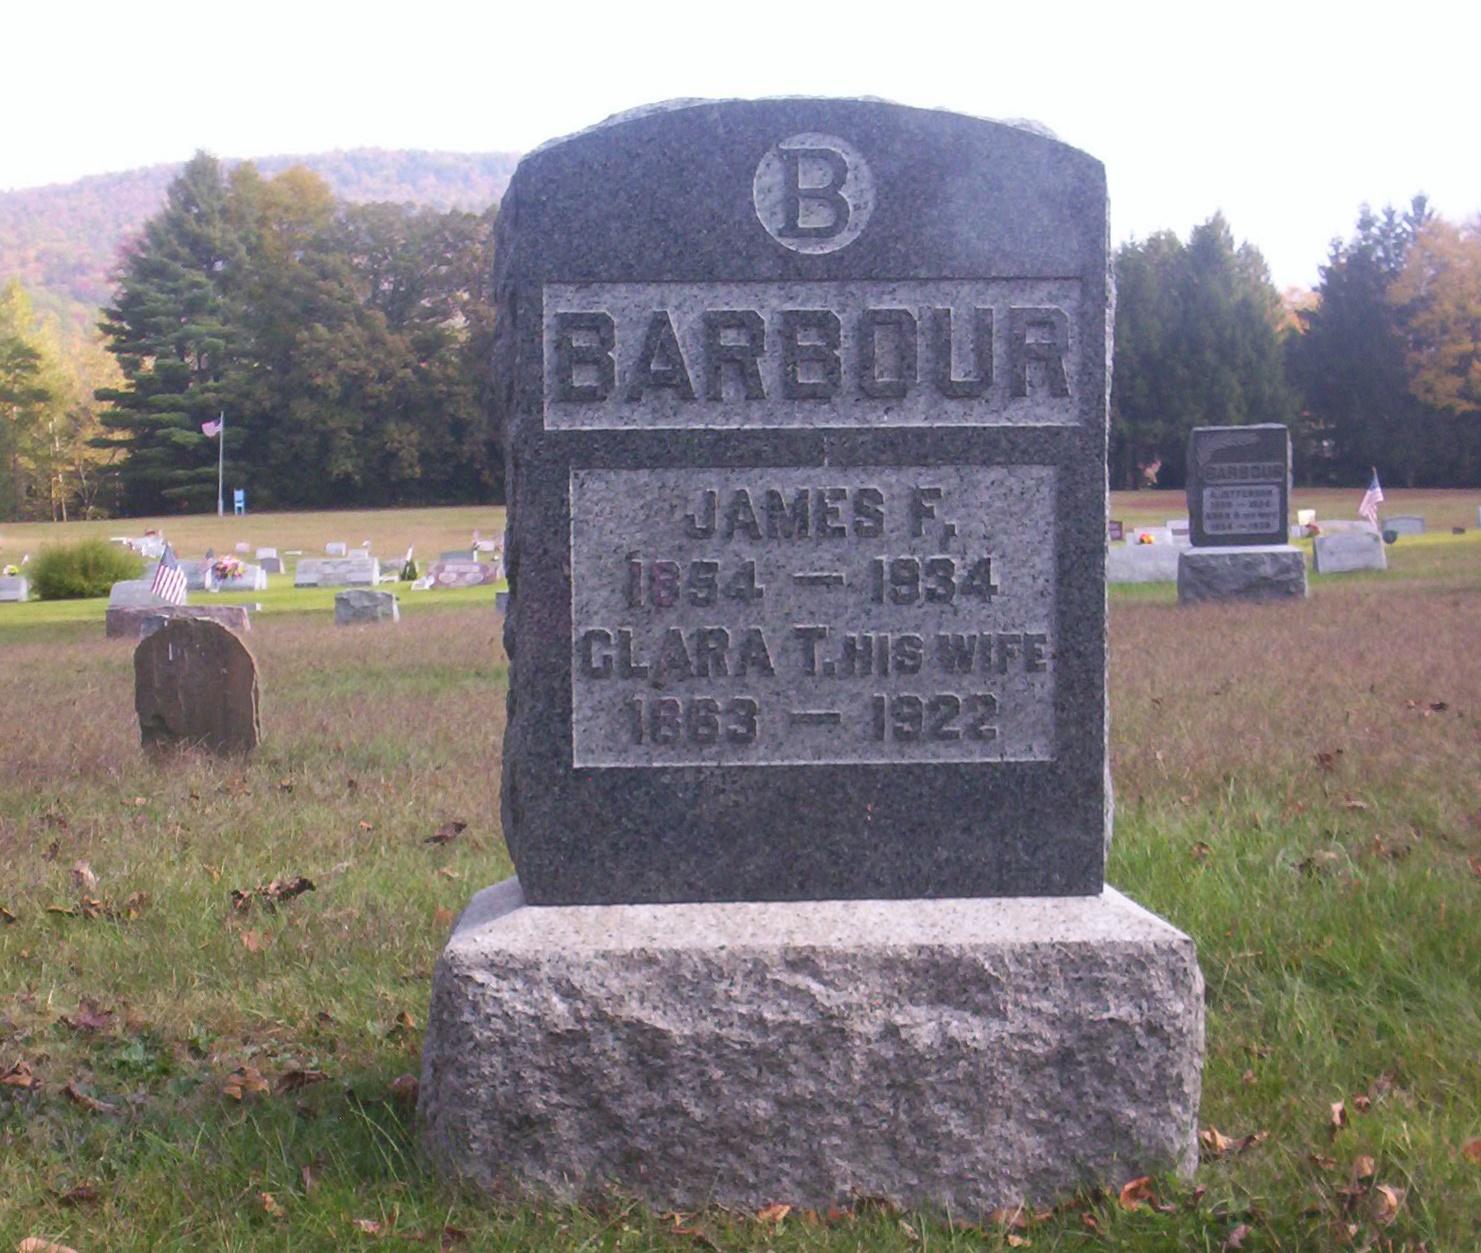 James F Barbour